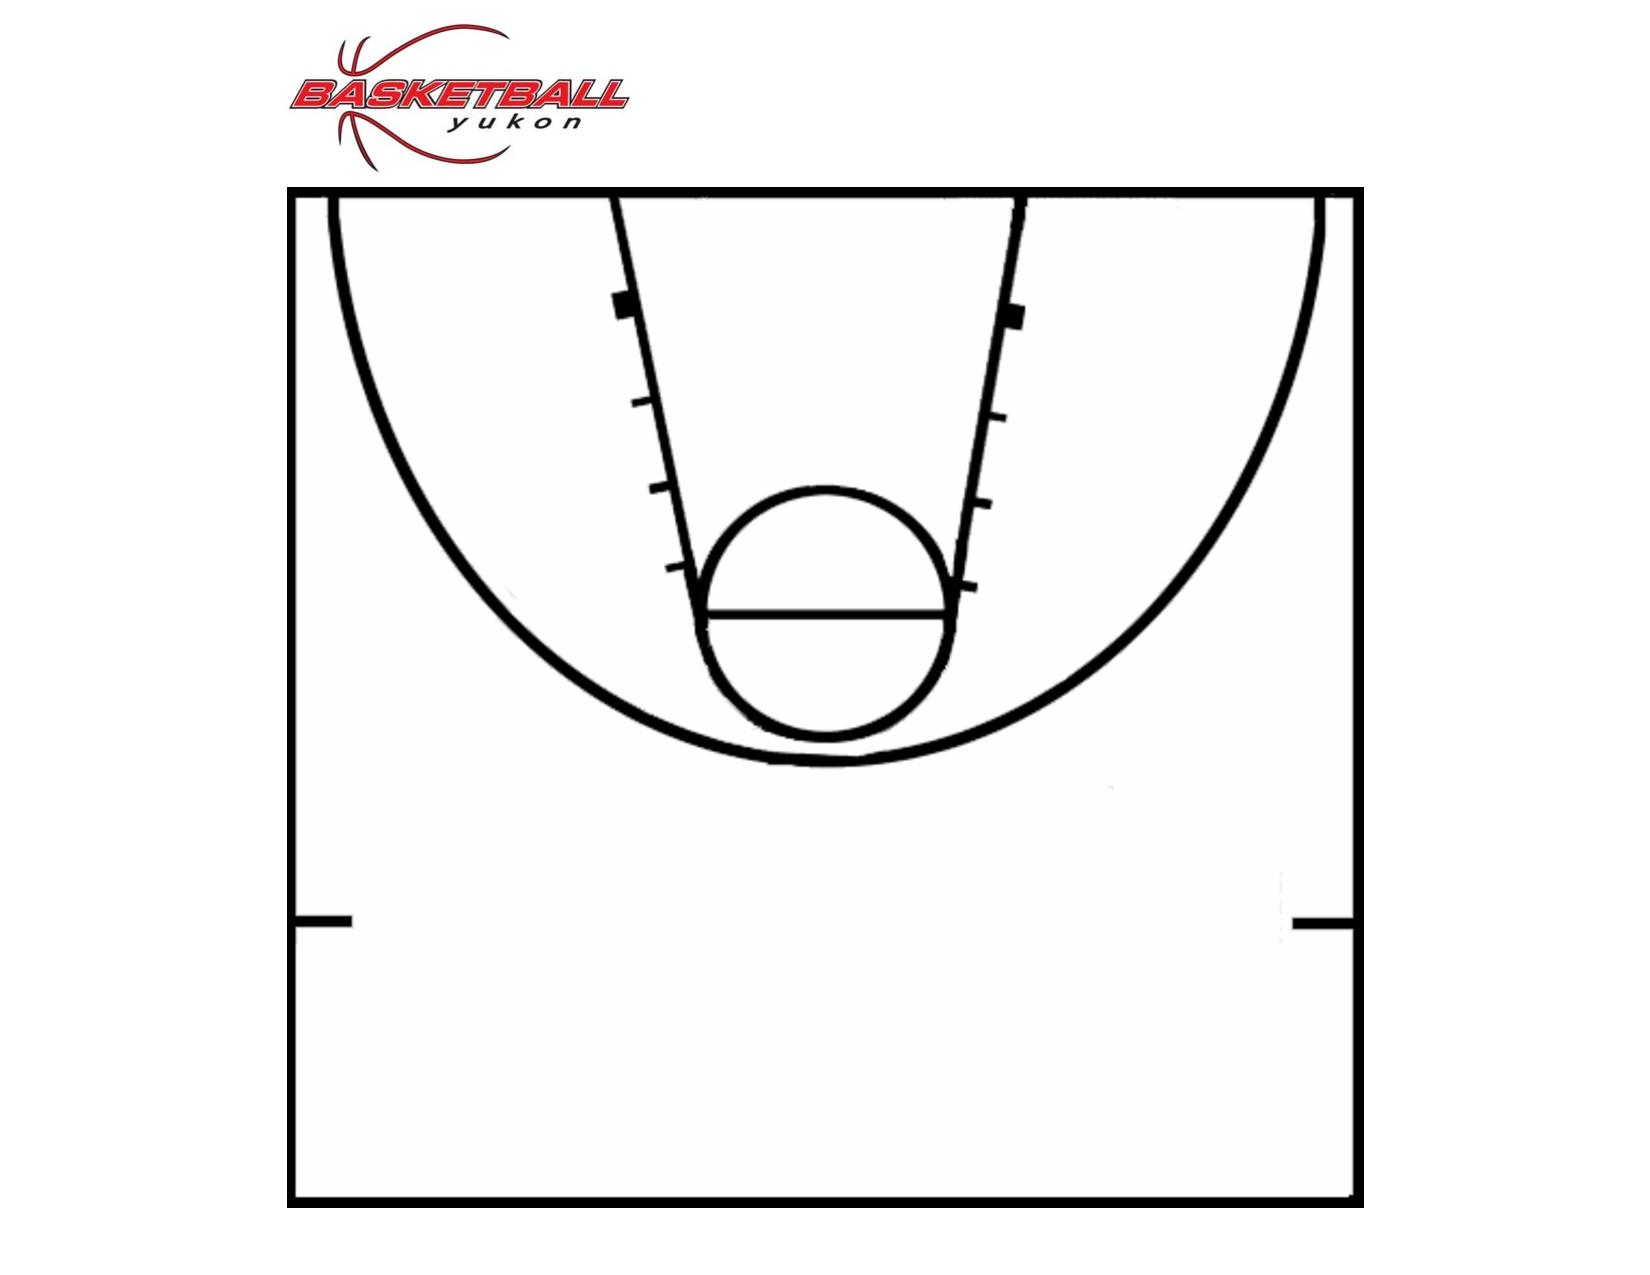 Printable Basketball Court | Clipart Panda - Free Clipart Images - Free Printable Basketball Court